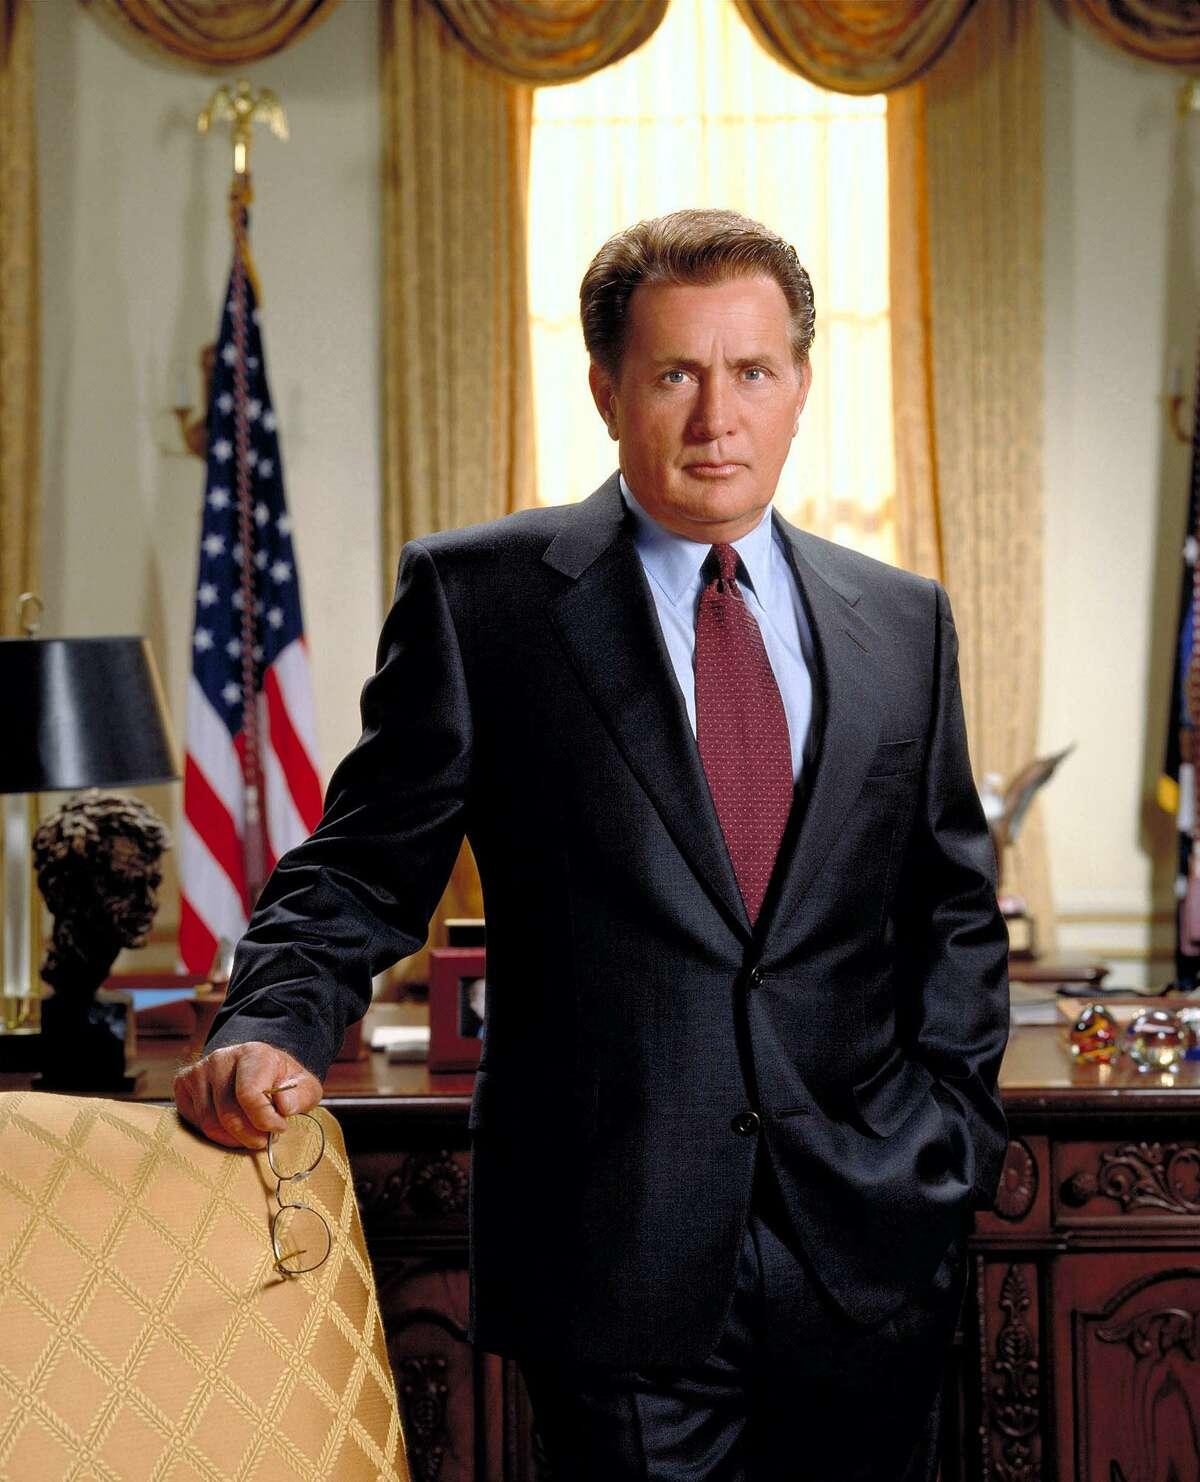 Martin Sheen as President Josiah Bartletl